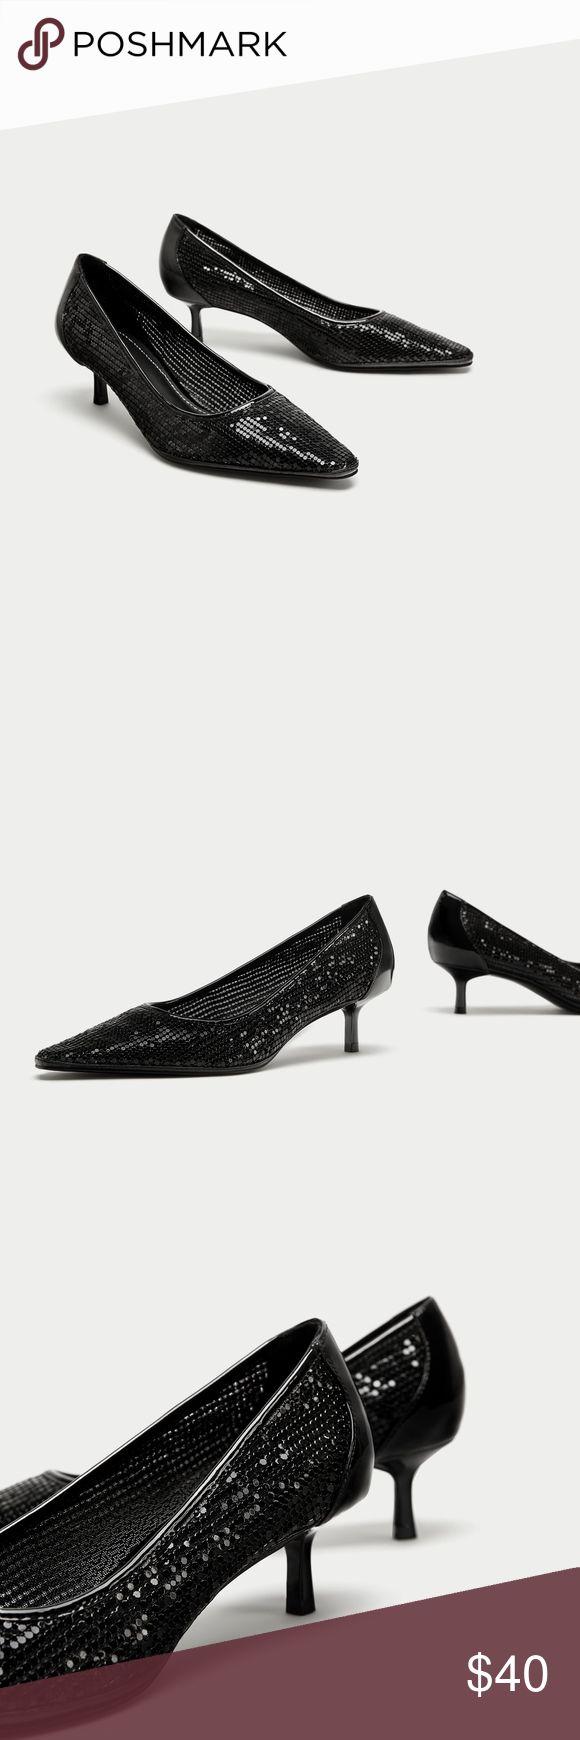 ZARA METAL MESH LOW HEEL COURT SHOES Black mid-heel shoes. Mesh detail on the upper. Patent finish back.  Heel height of 5.1 cm. / 2.0″ Zara Shoes Heels